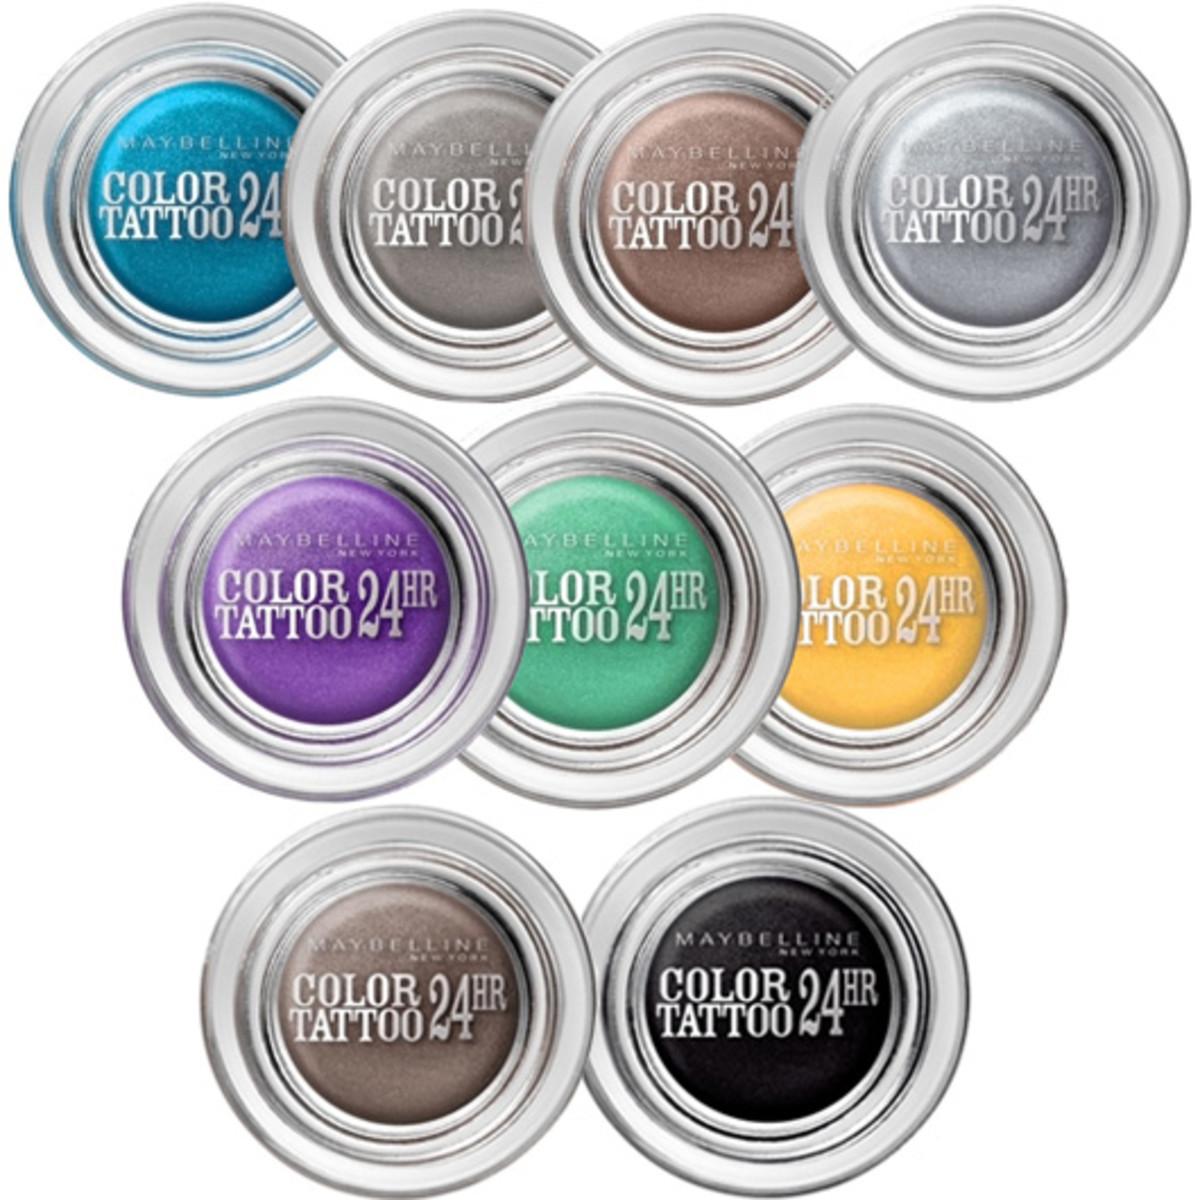 Maybelline-New-York-Color-Tattoo-24hr-Eyeshadow